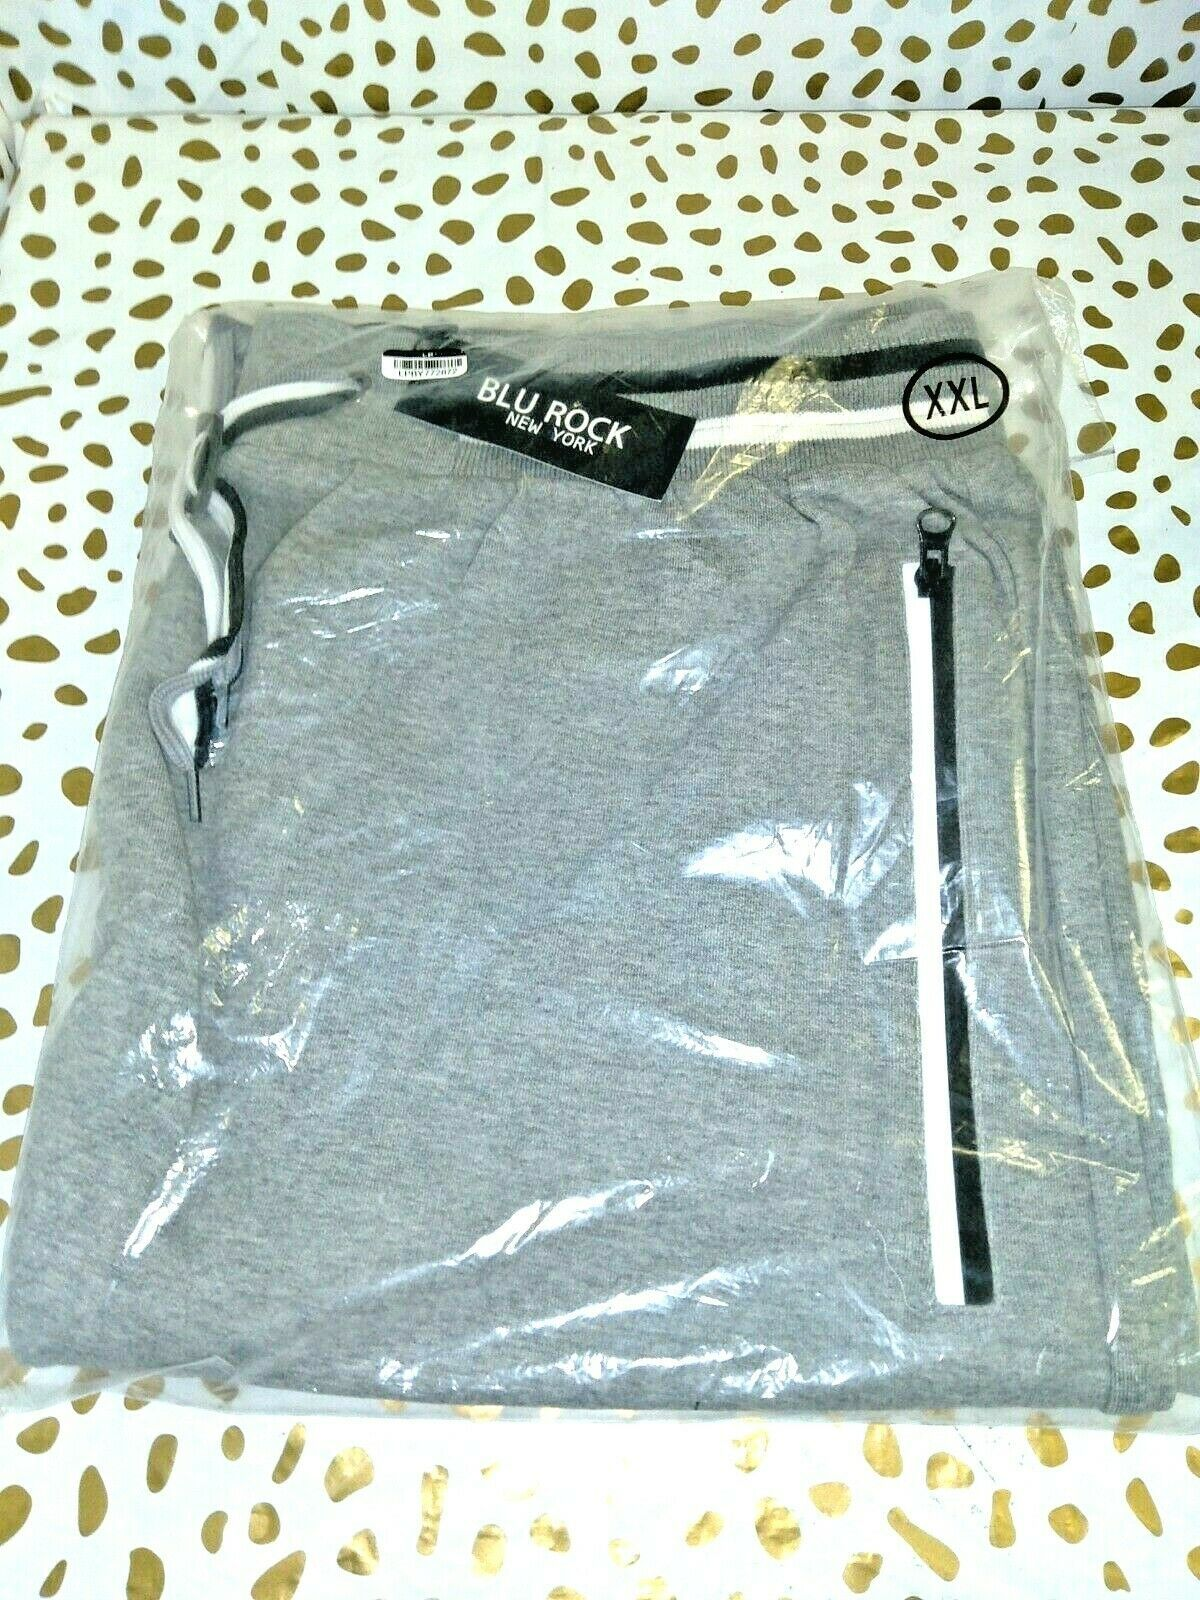 Blu Rock New York  jogger/athletic shorts with zipper pockets Size XXL FREE/SHIP